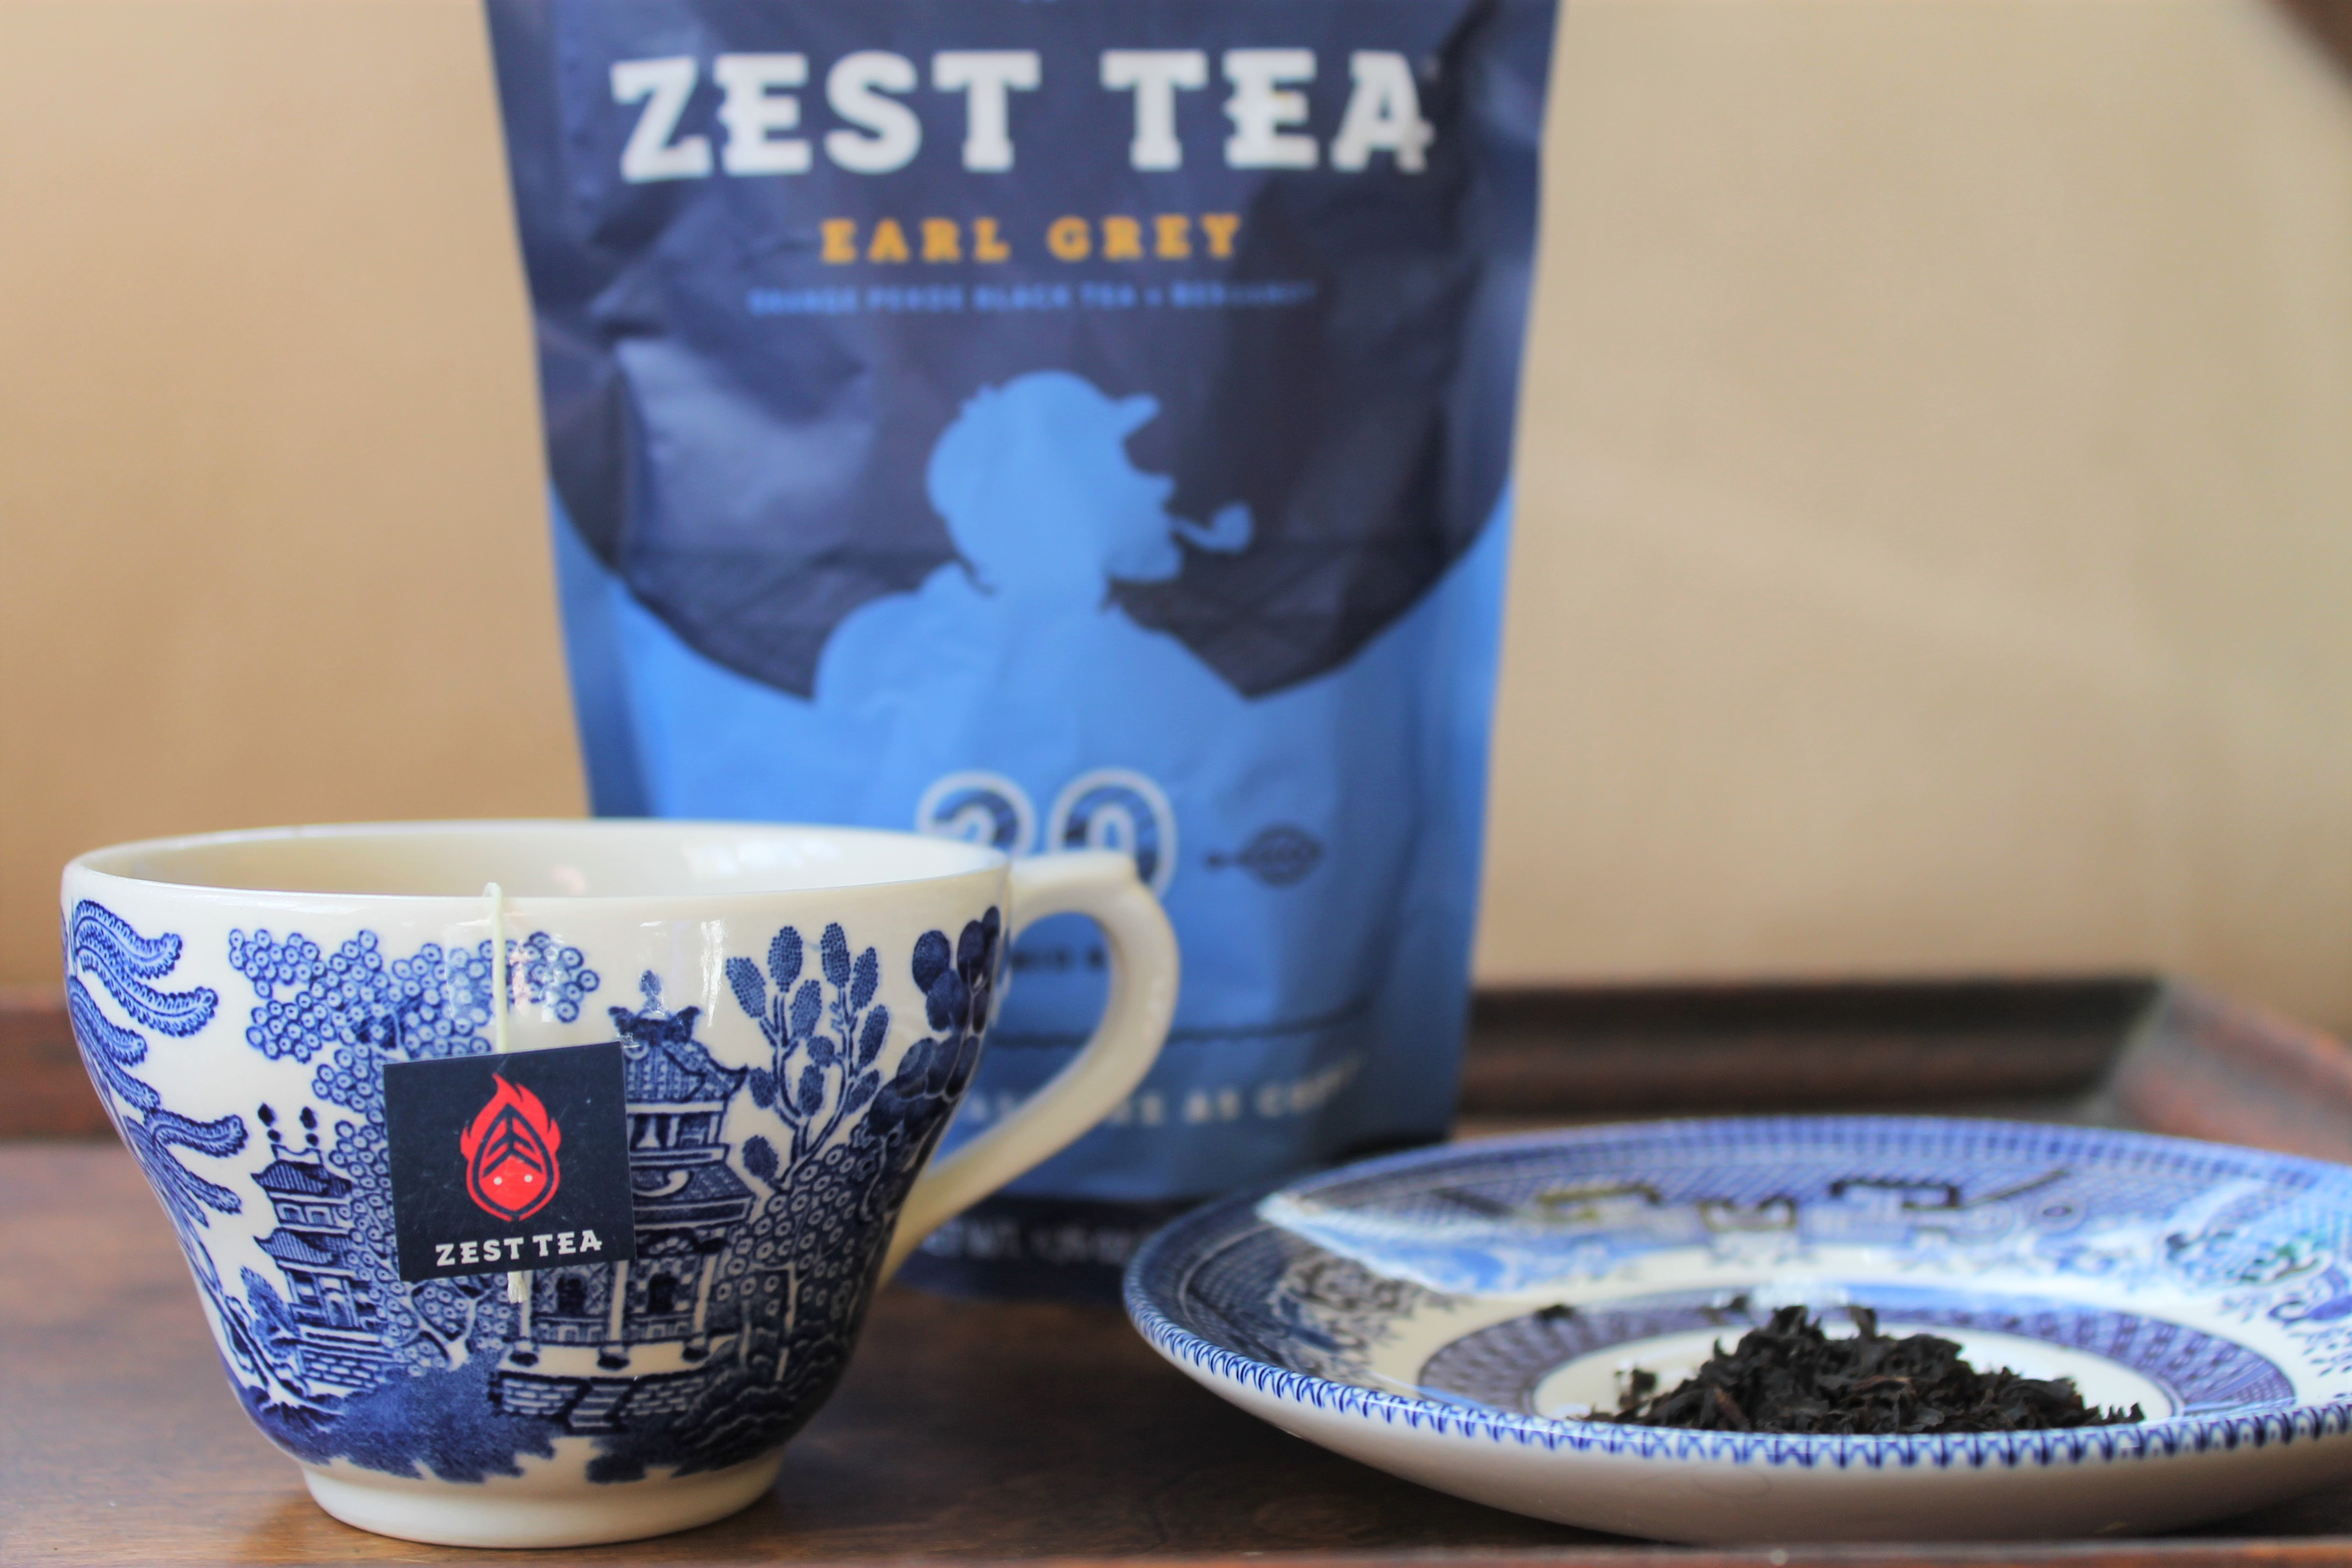 zest tea earl grey teabags